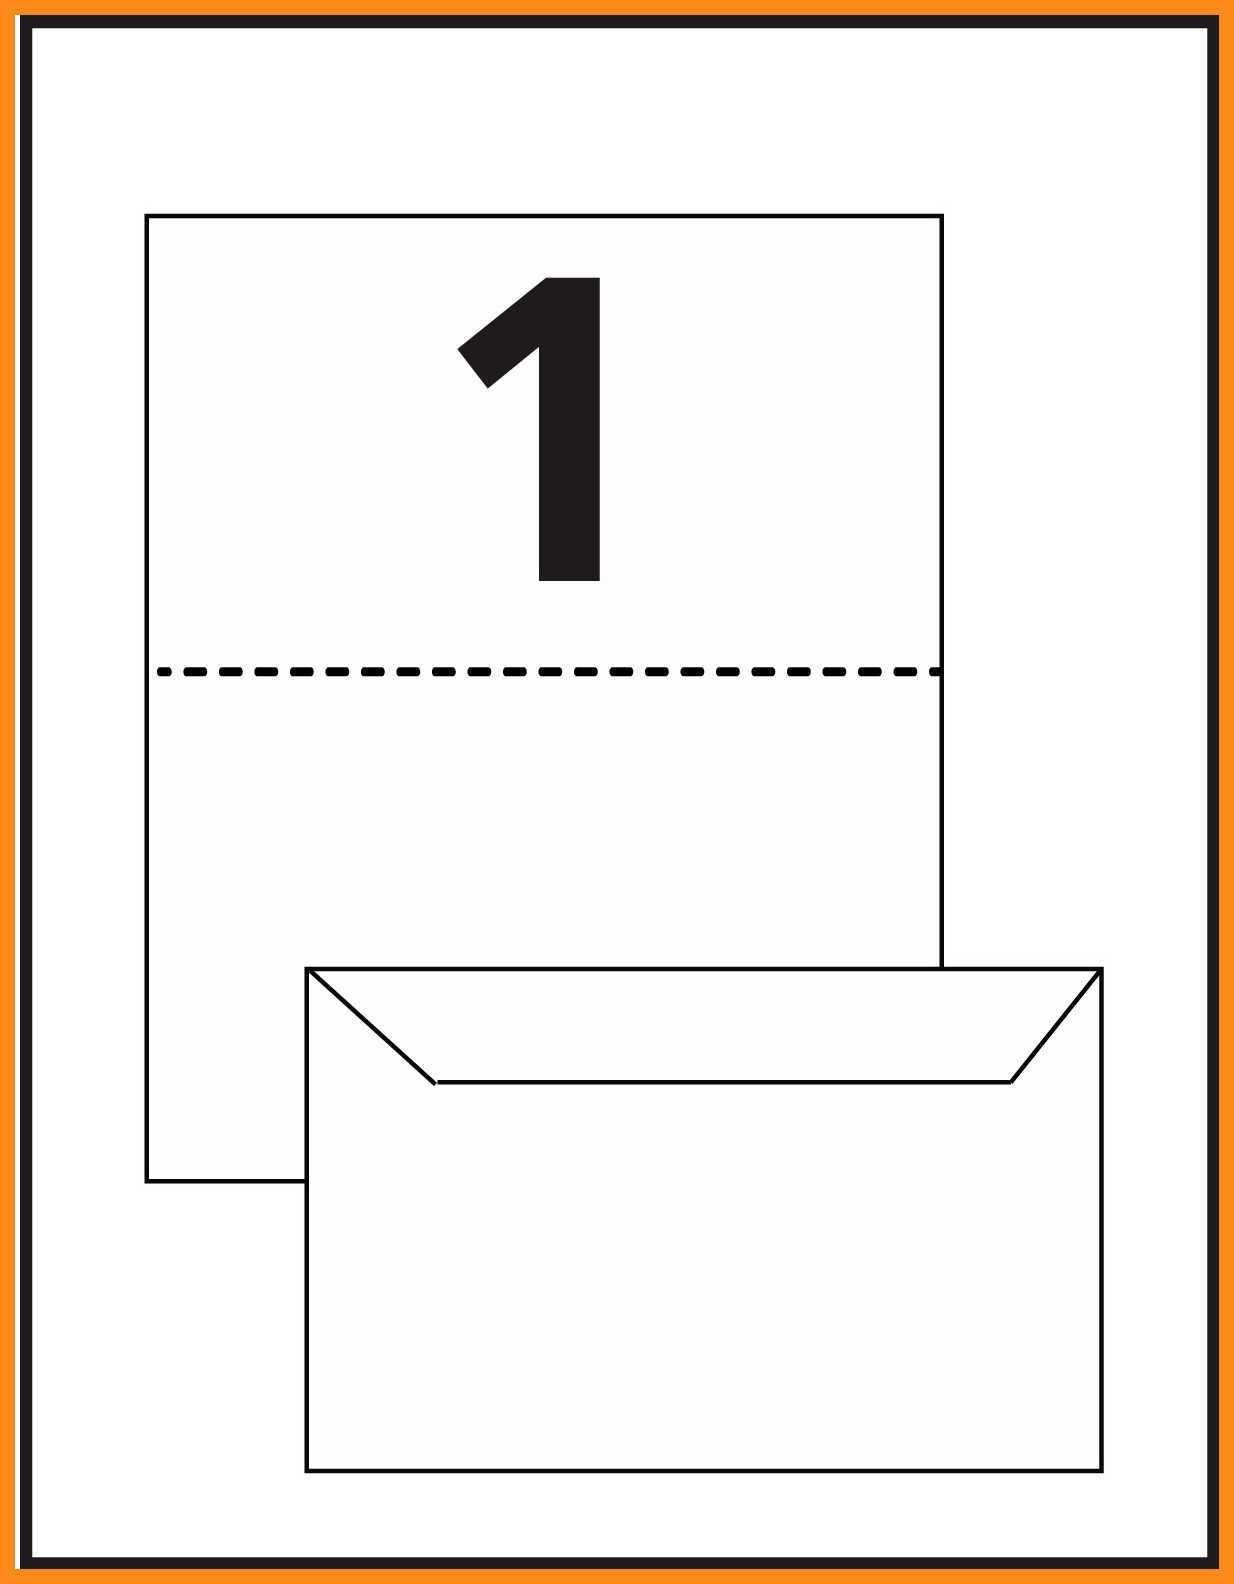 12 13 Blank Quarter Fold Card Template | Lascazuelasphilly With Blank Quarter Fold Card Template